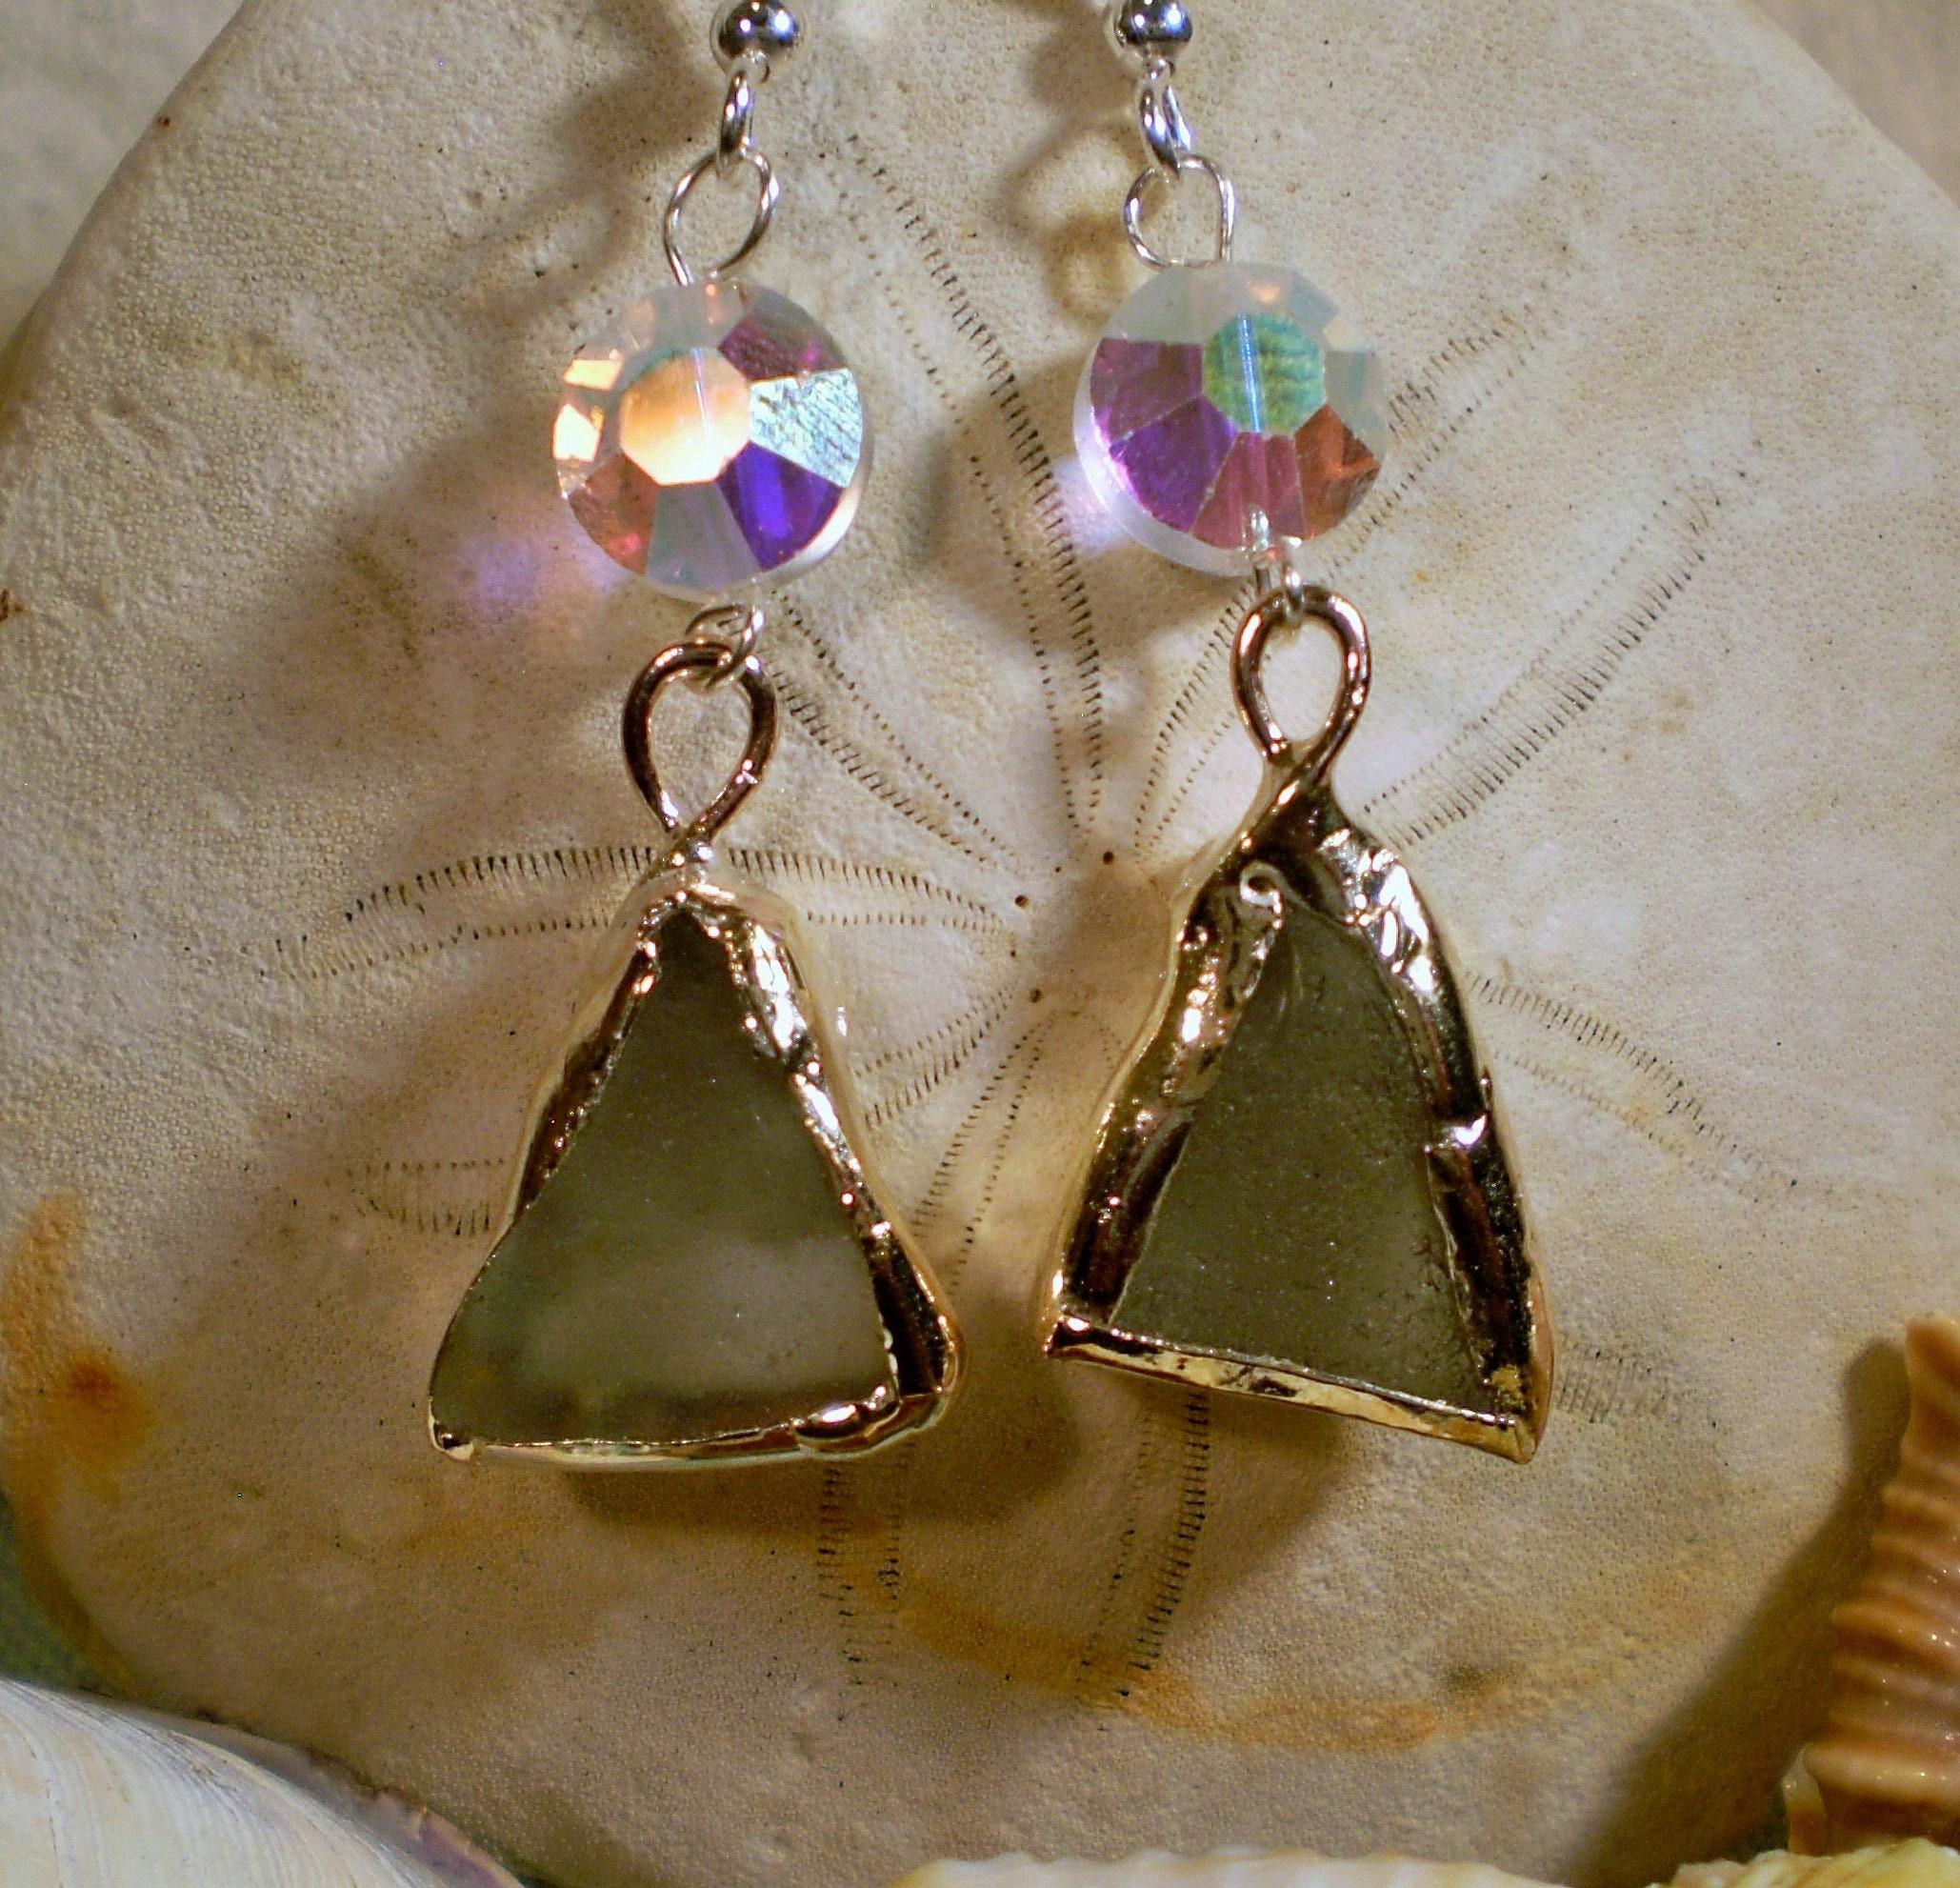 4e152f010671 Stunning Pair of Sea Foam Sea Glass and Crystal Earrings